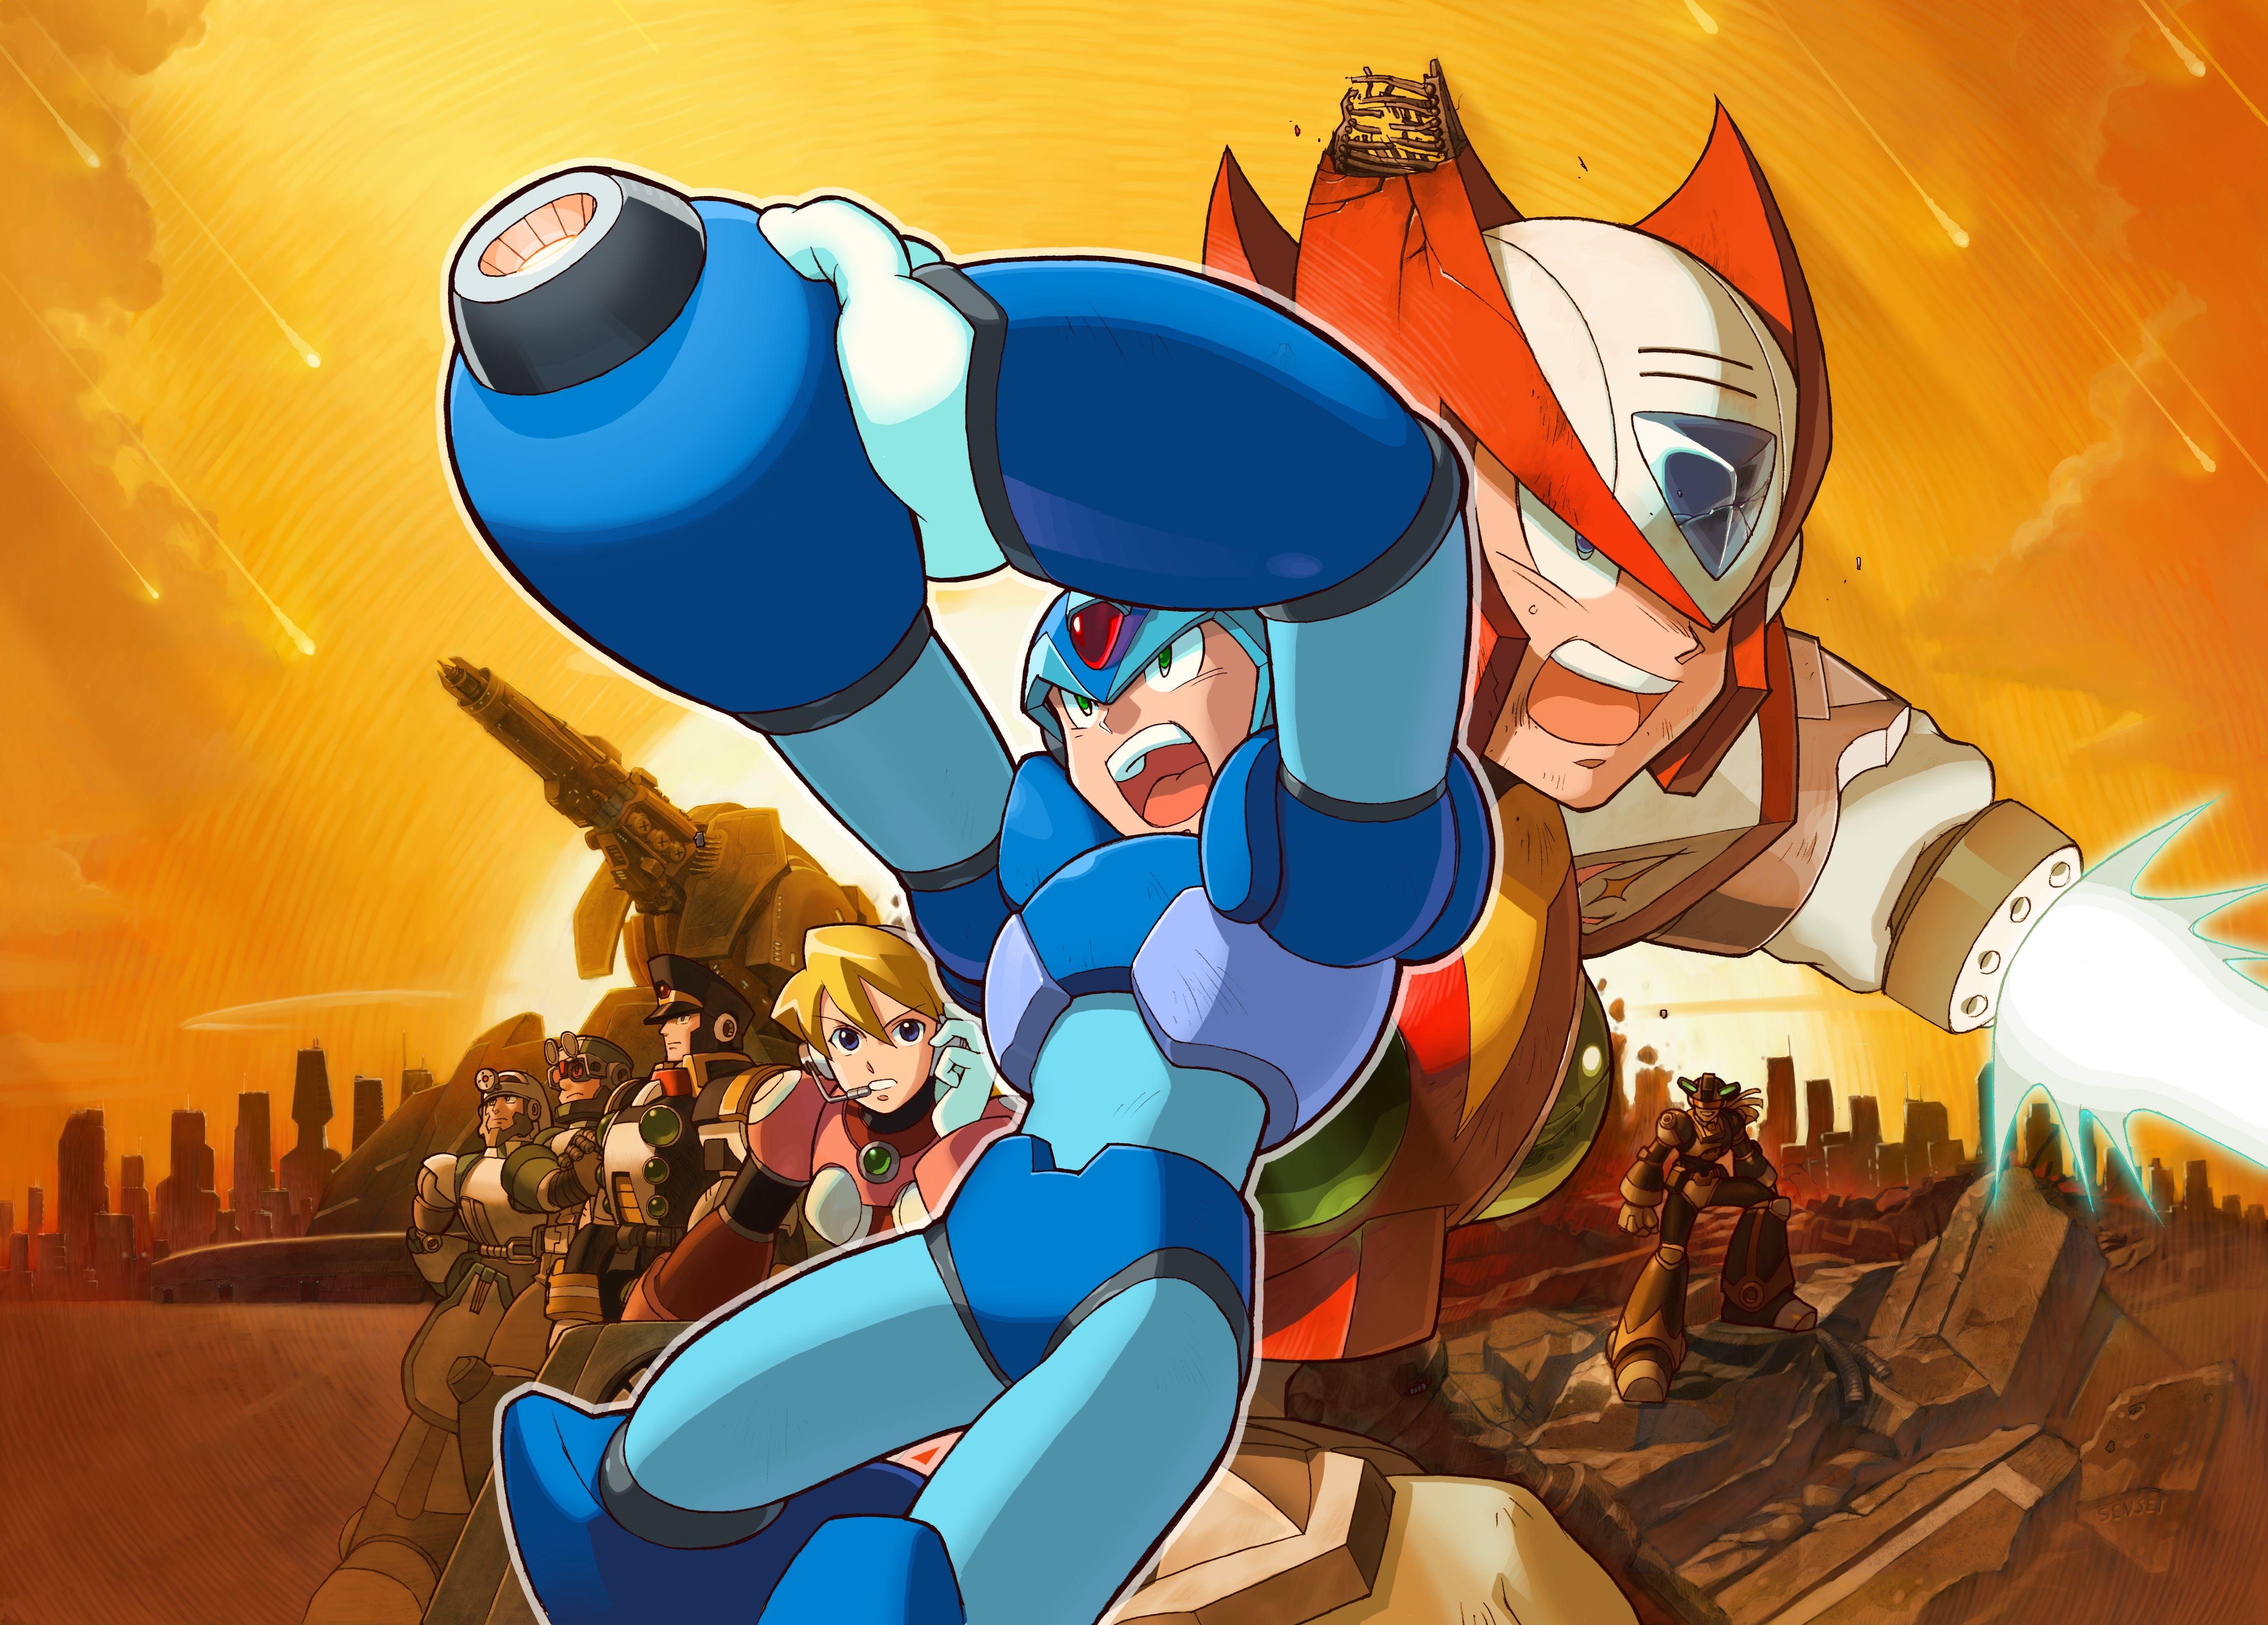 Mega man x5 mmkb fandom powered by wikia - Megaman wikia ...